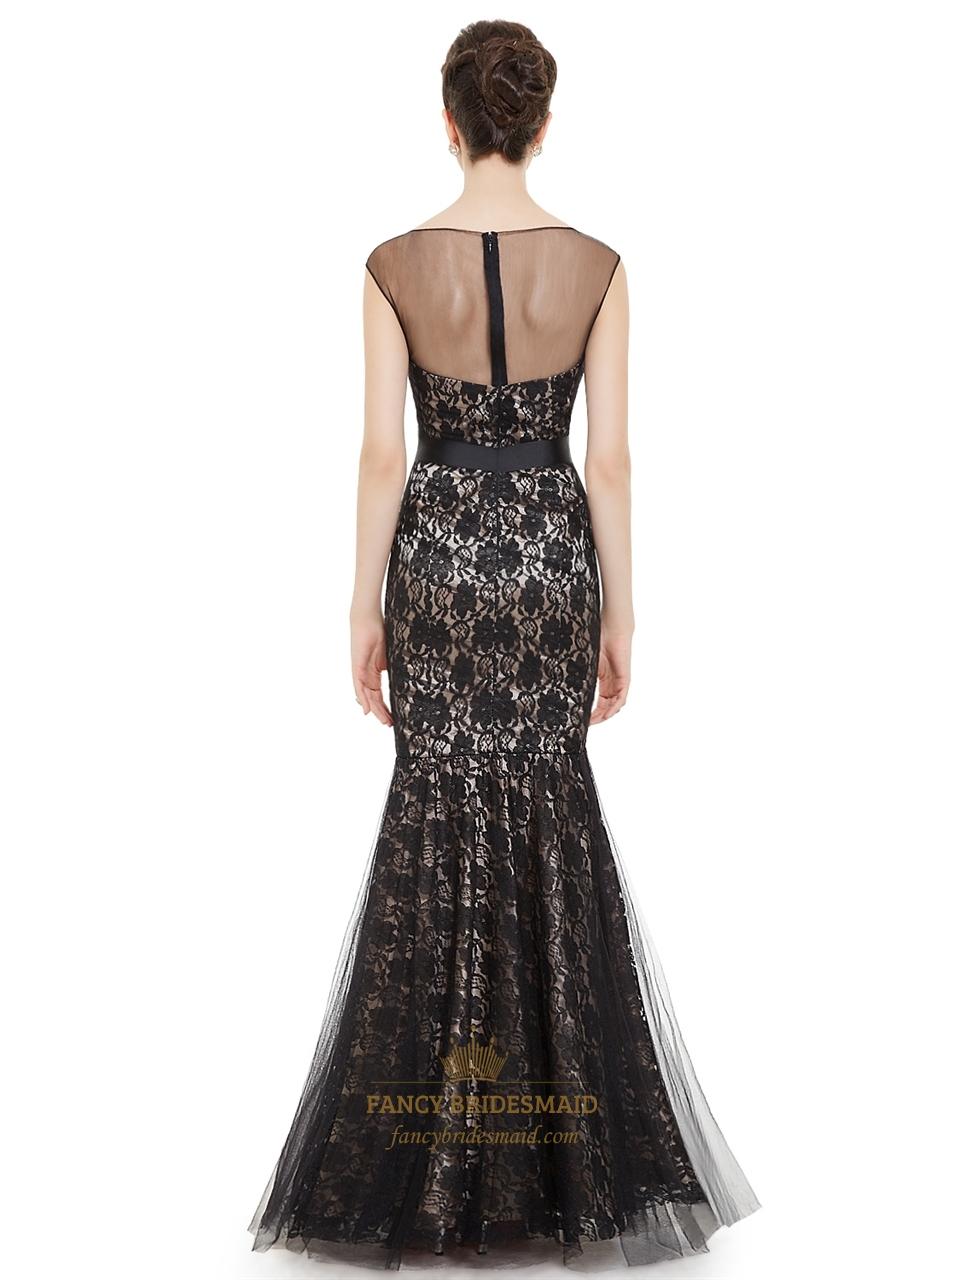 Black Illusion Neckline Mermaid Lace Prom Dress With Cap